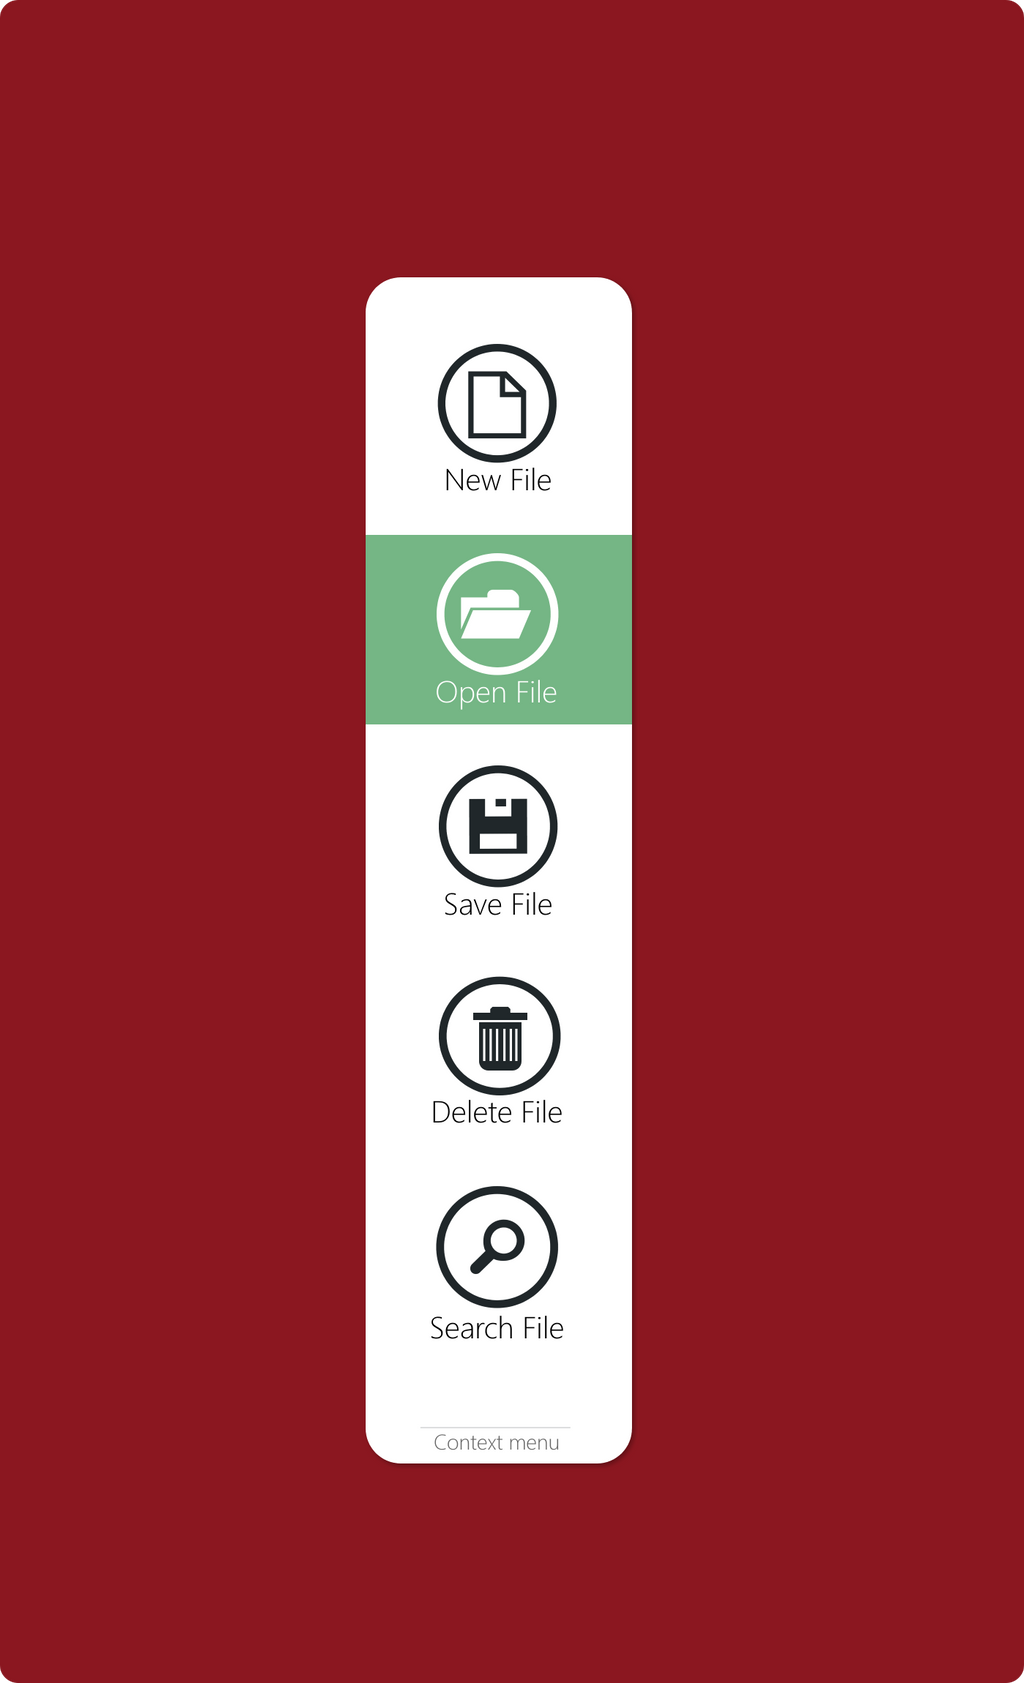 Desktop ContextMenu